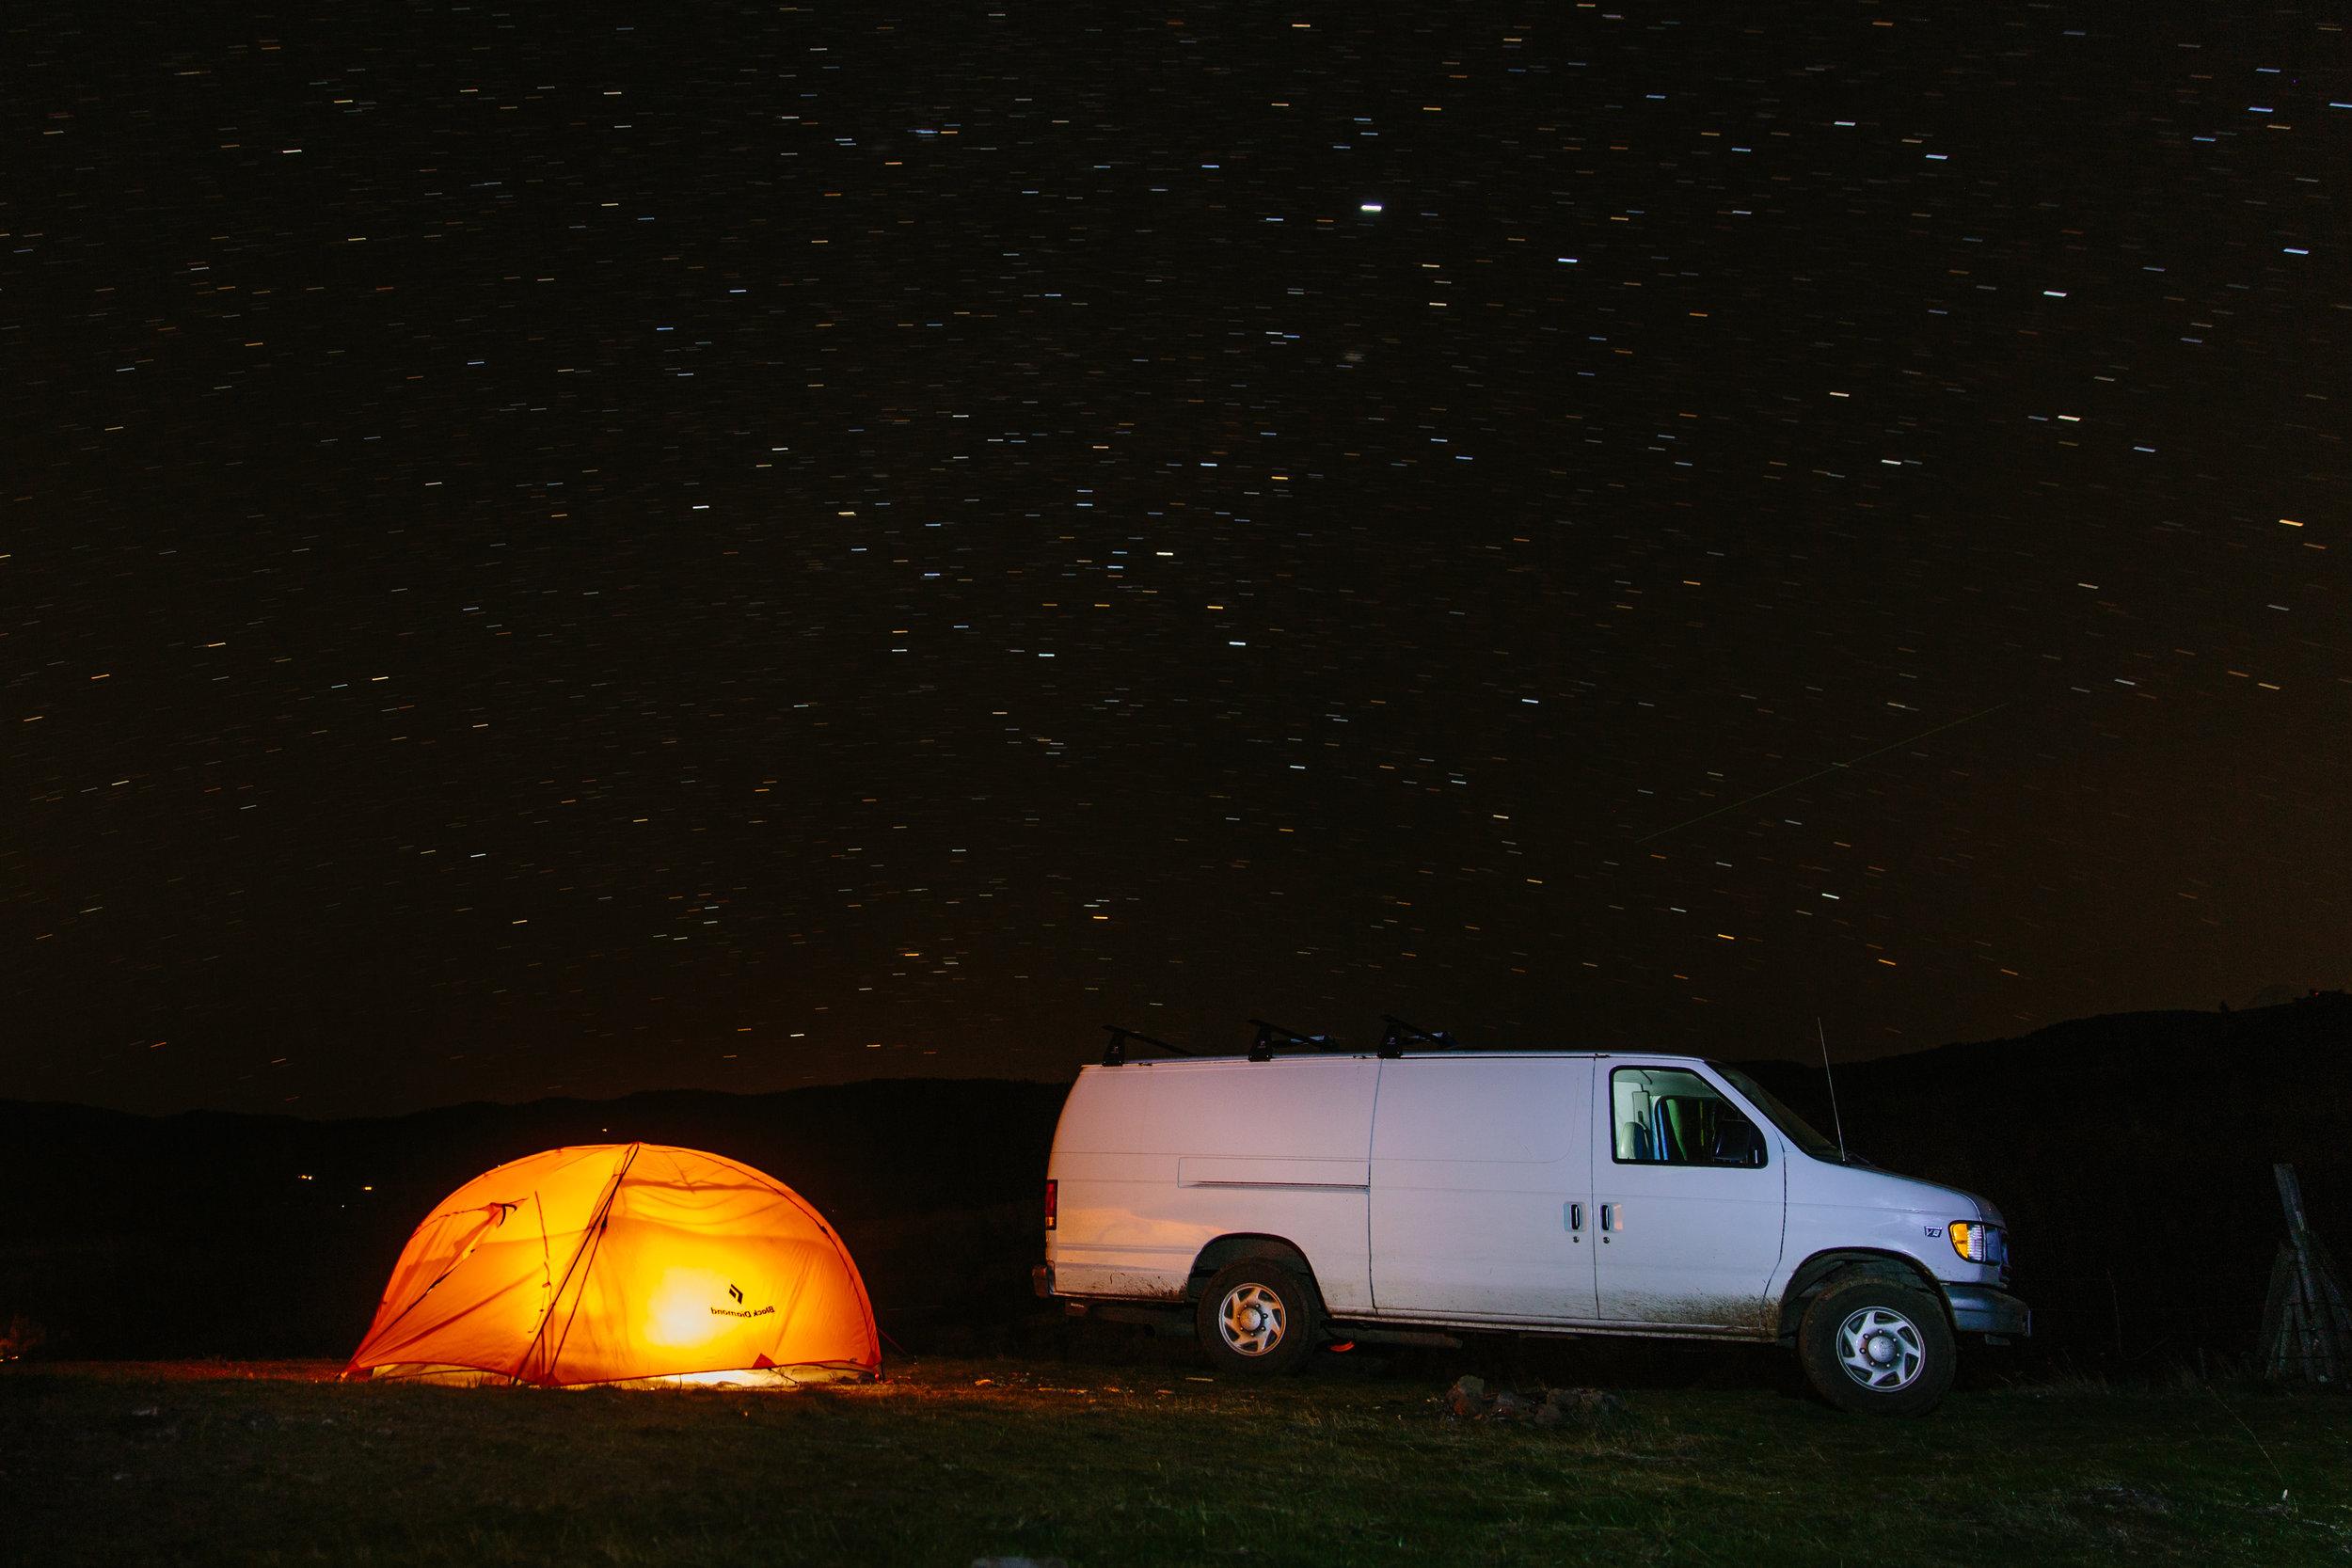 Star light, star bright, where do you want to sleep tonight?